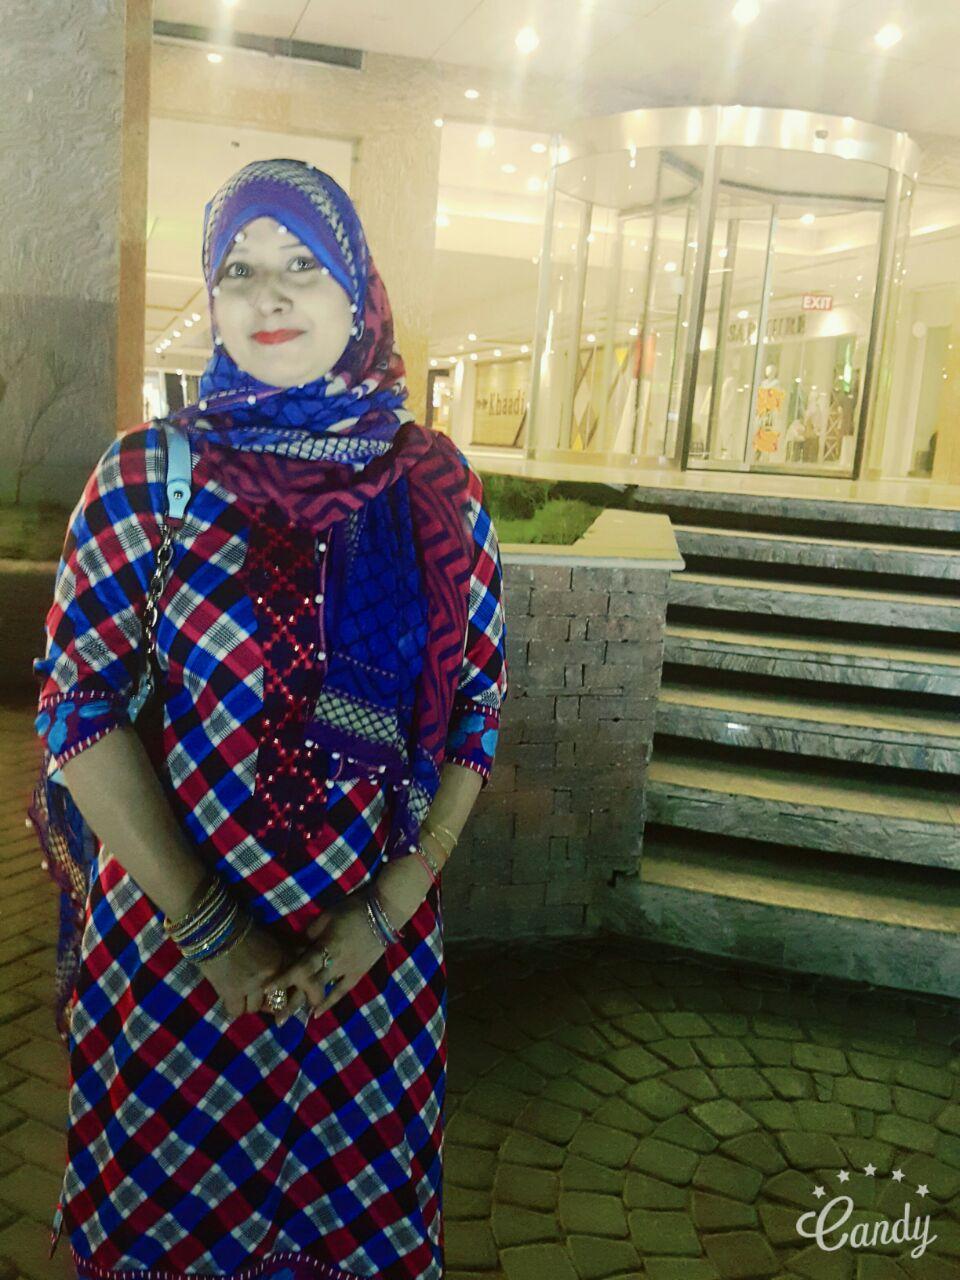 Hira Rajput Accounting, Management, Human Resources, Finance, Audit